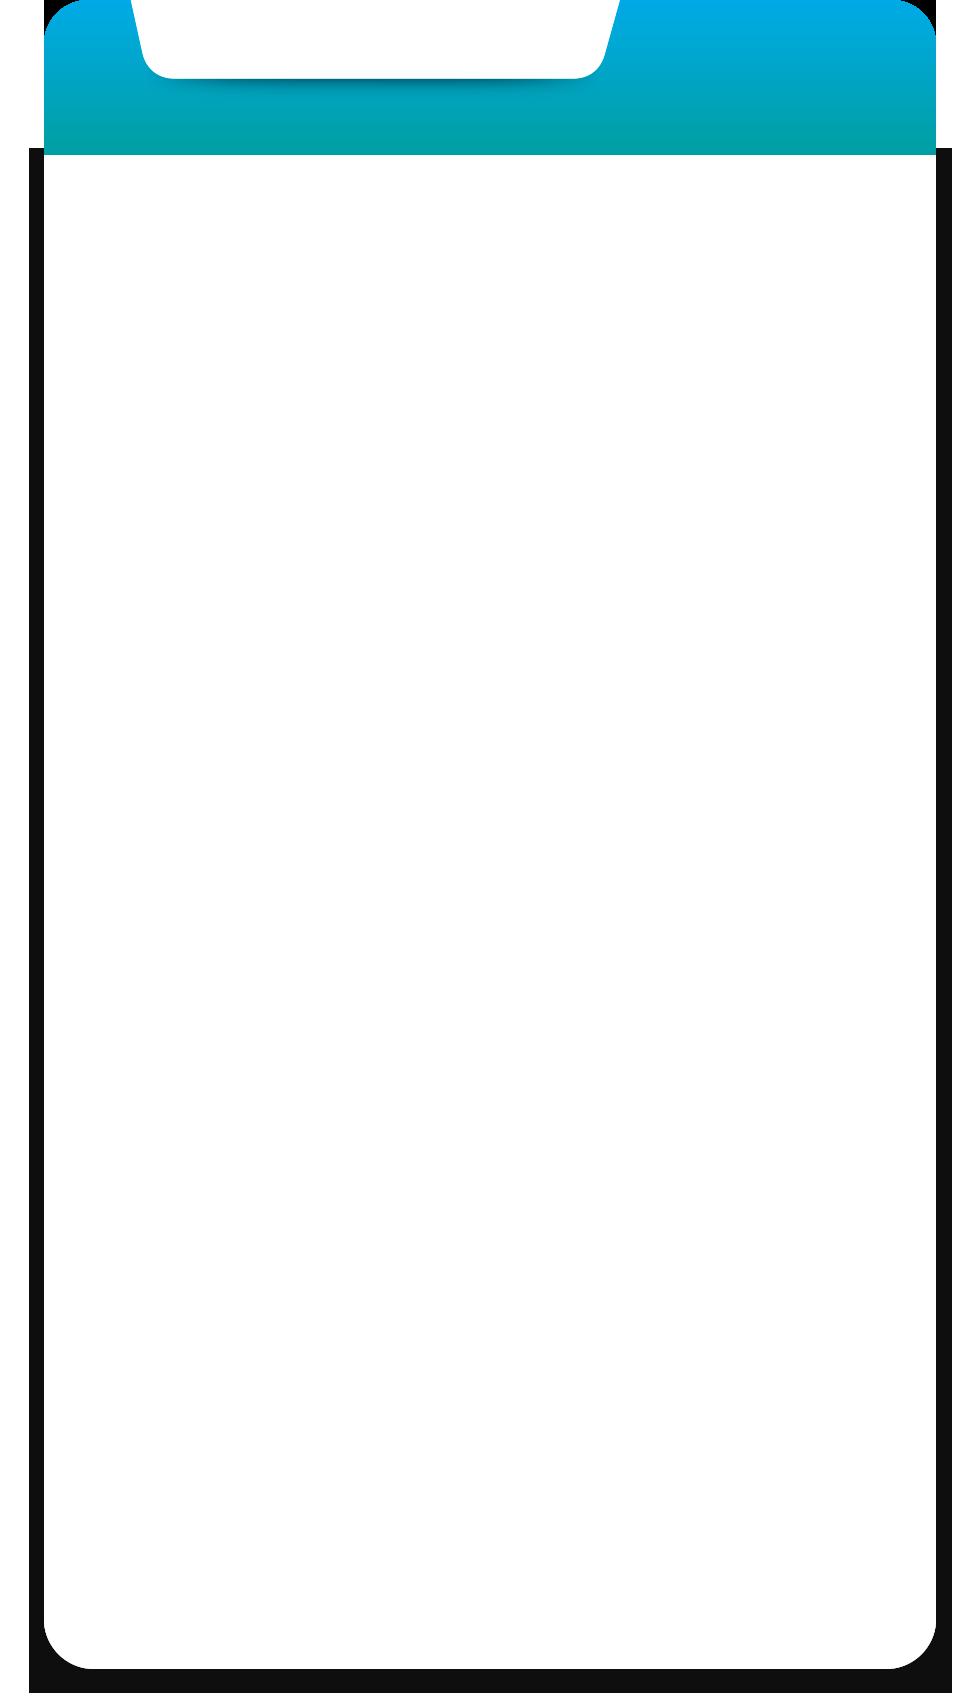 FAQ bkgd 1700.png